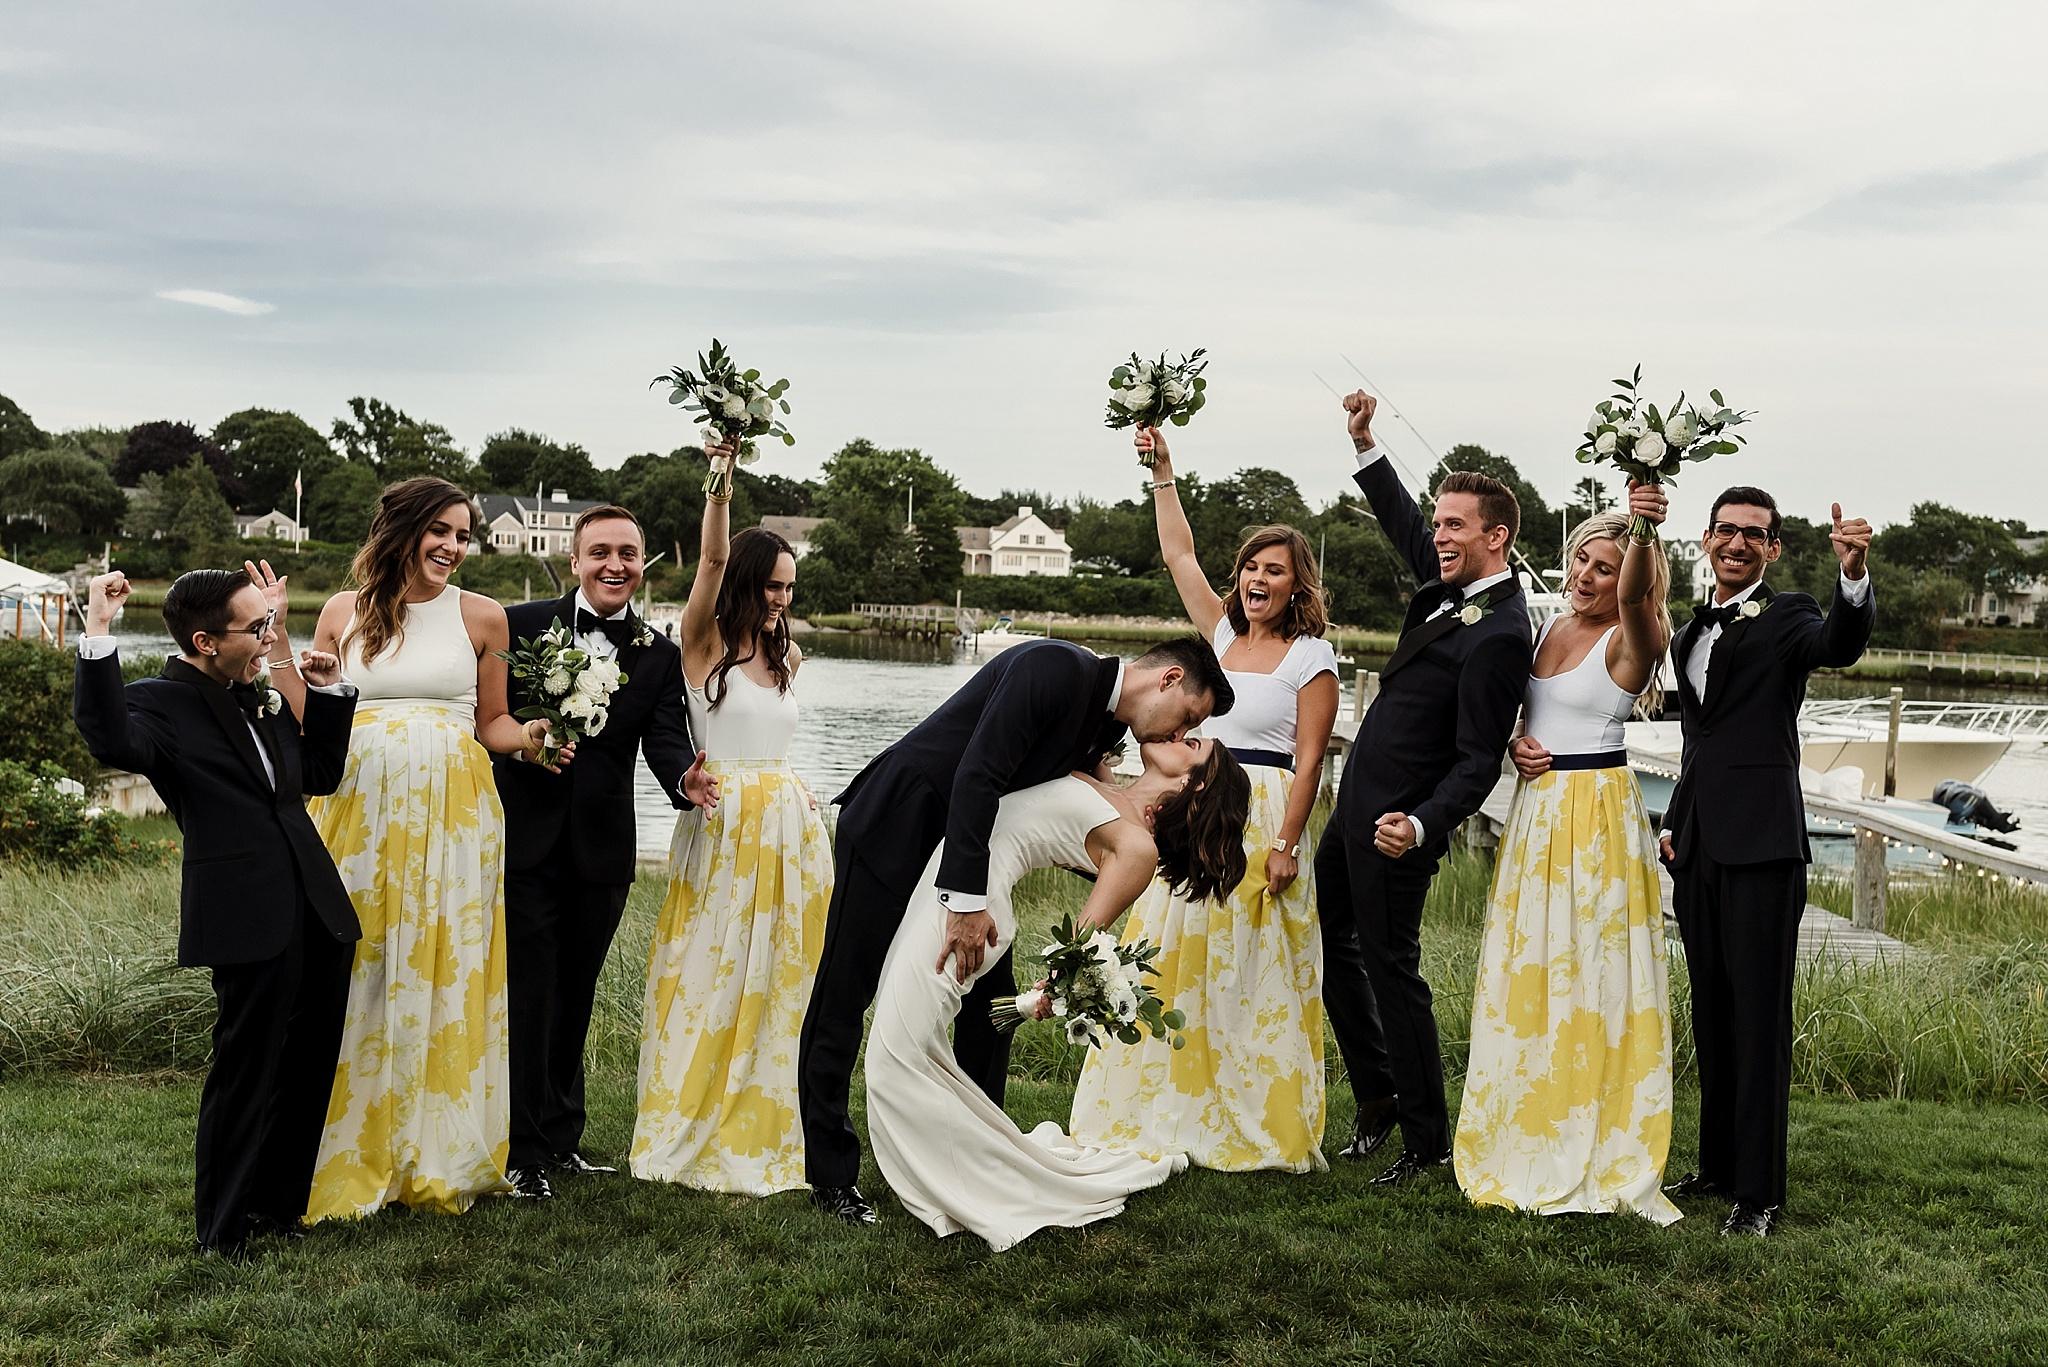 hudson_valley_wedding_0106.jpg